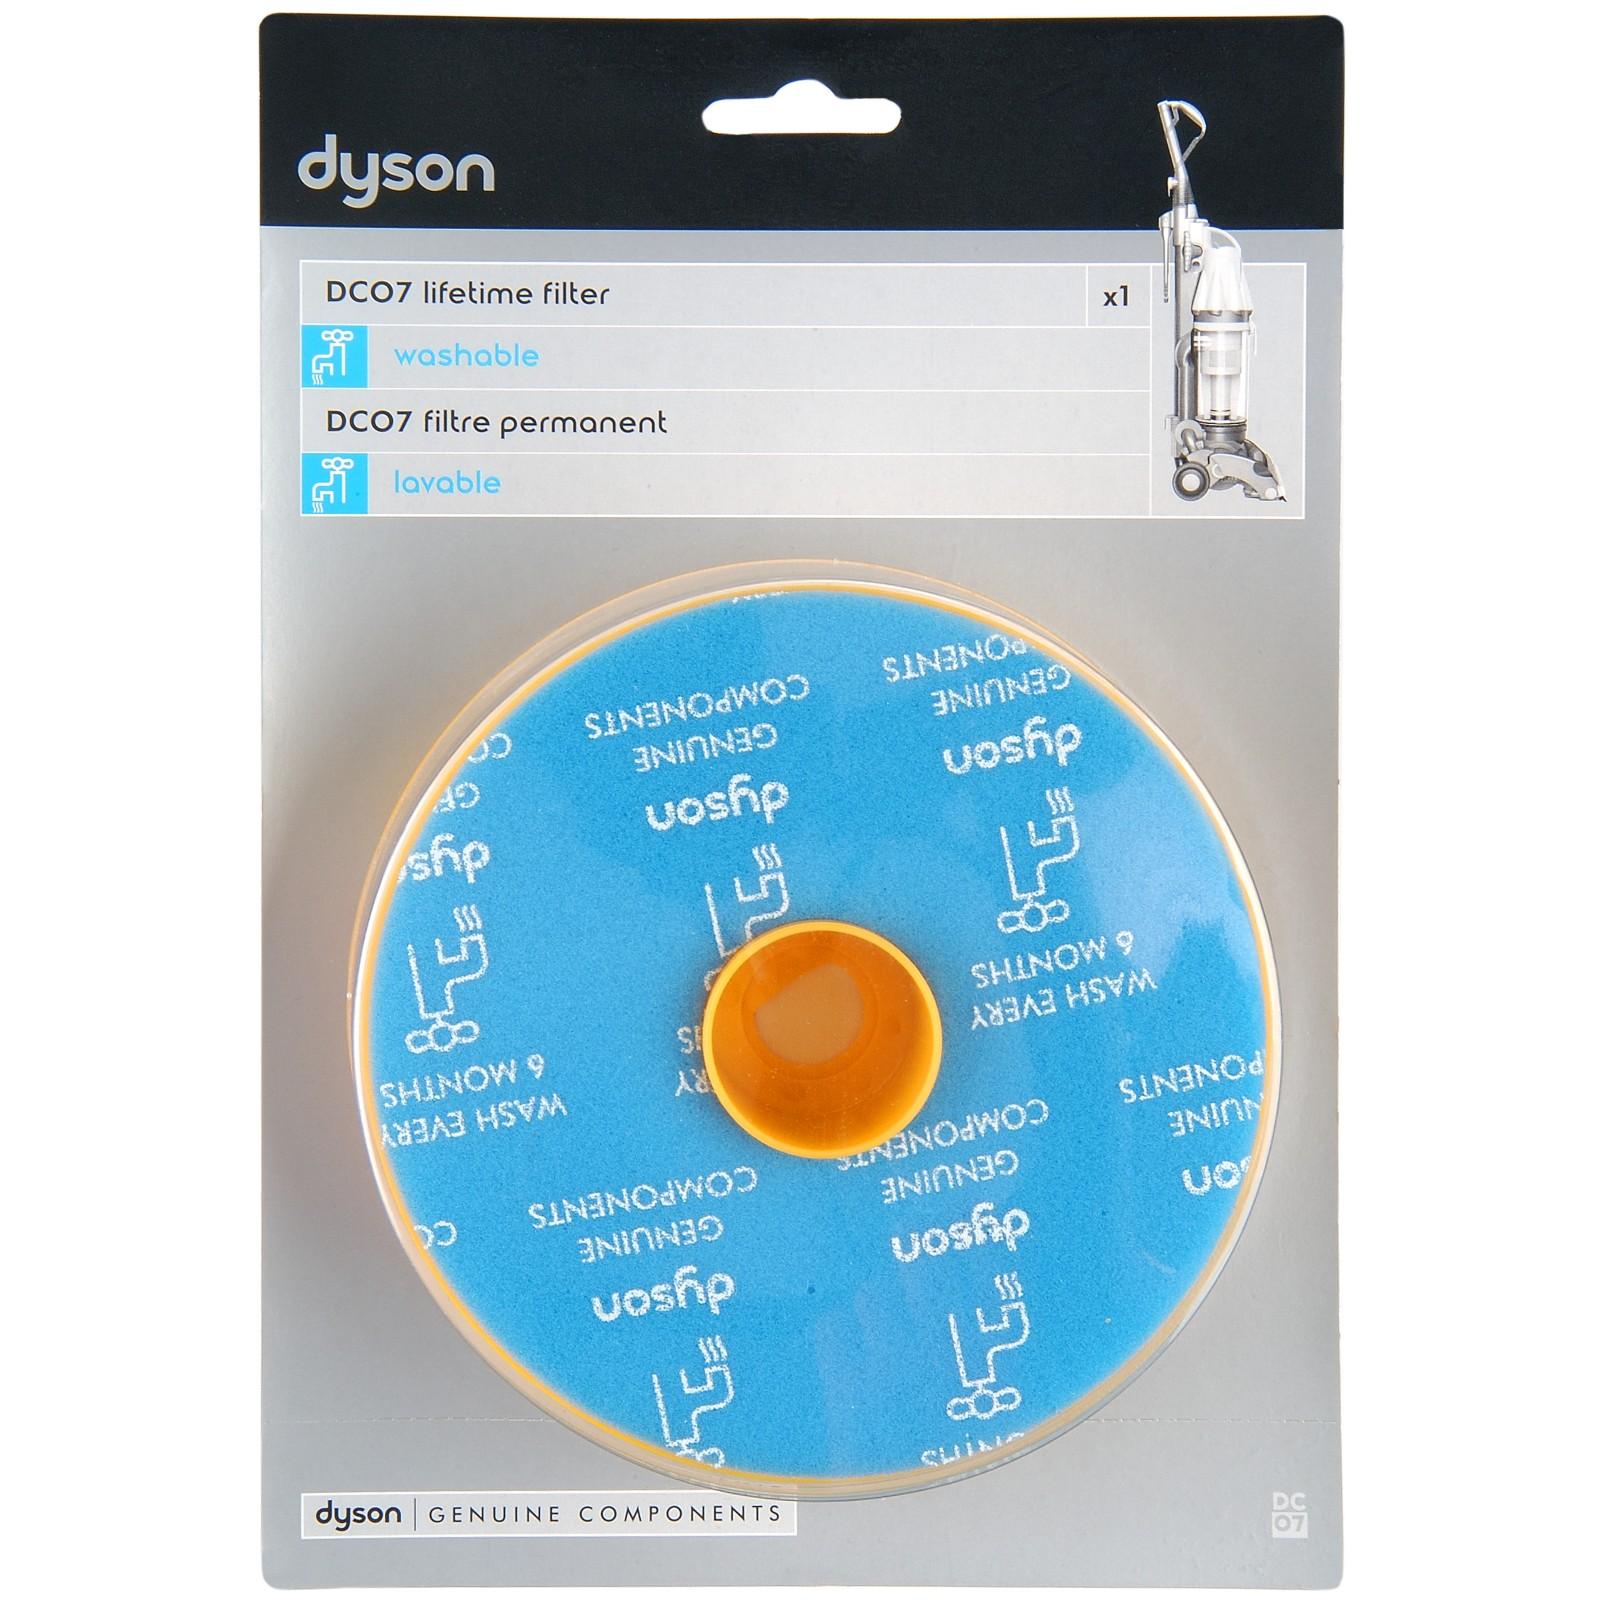 Dyson DC07 Washable Filter